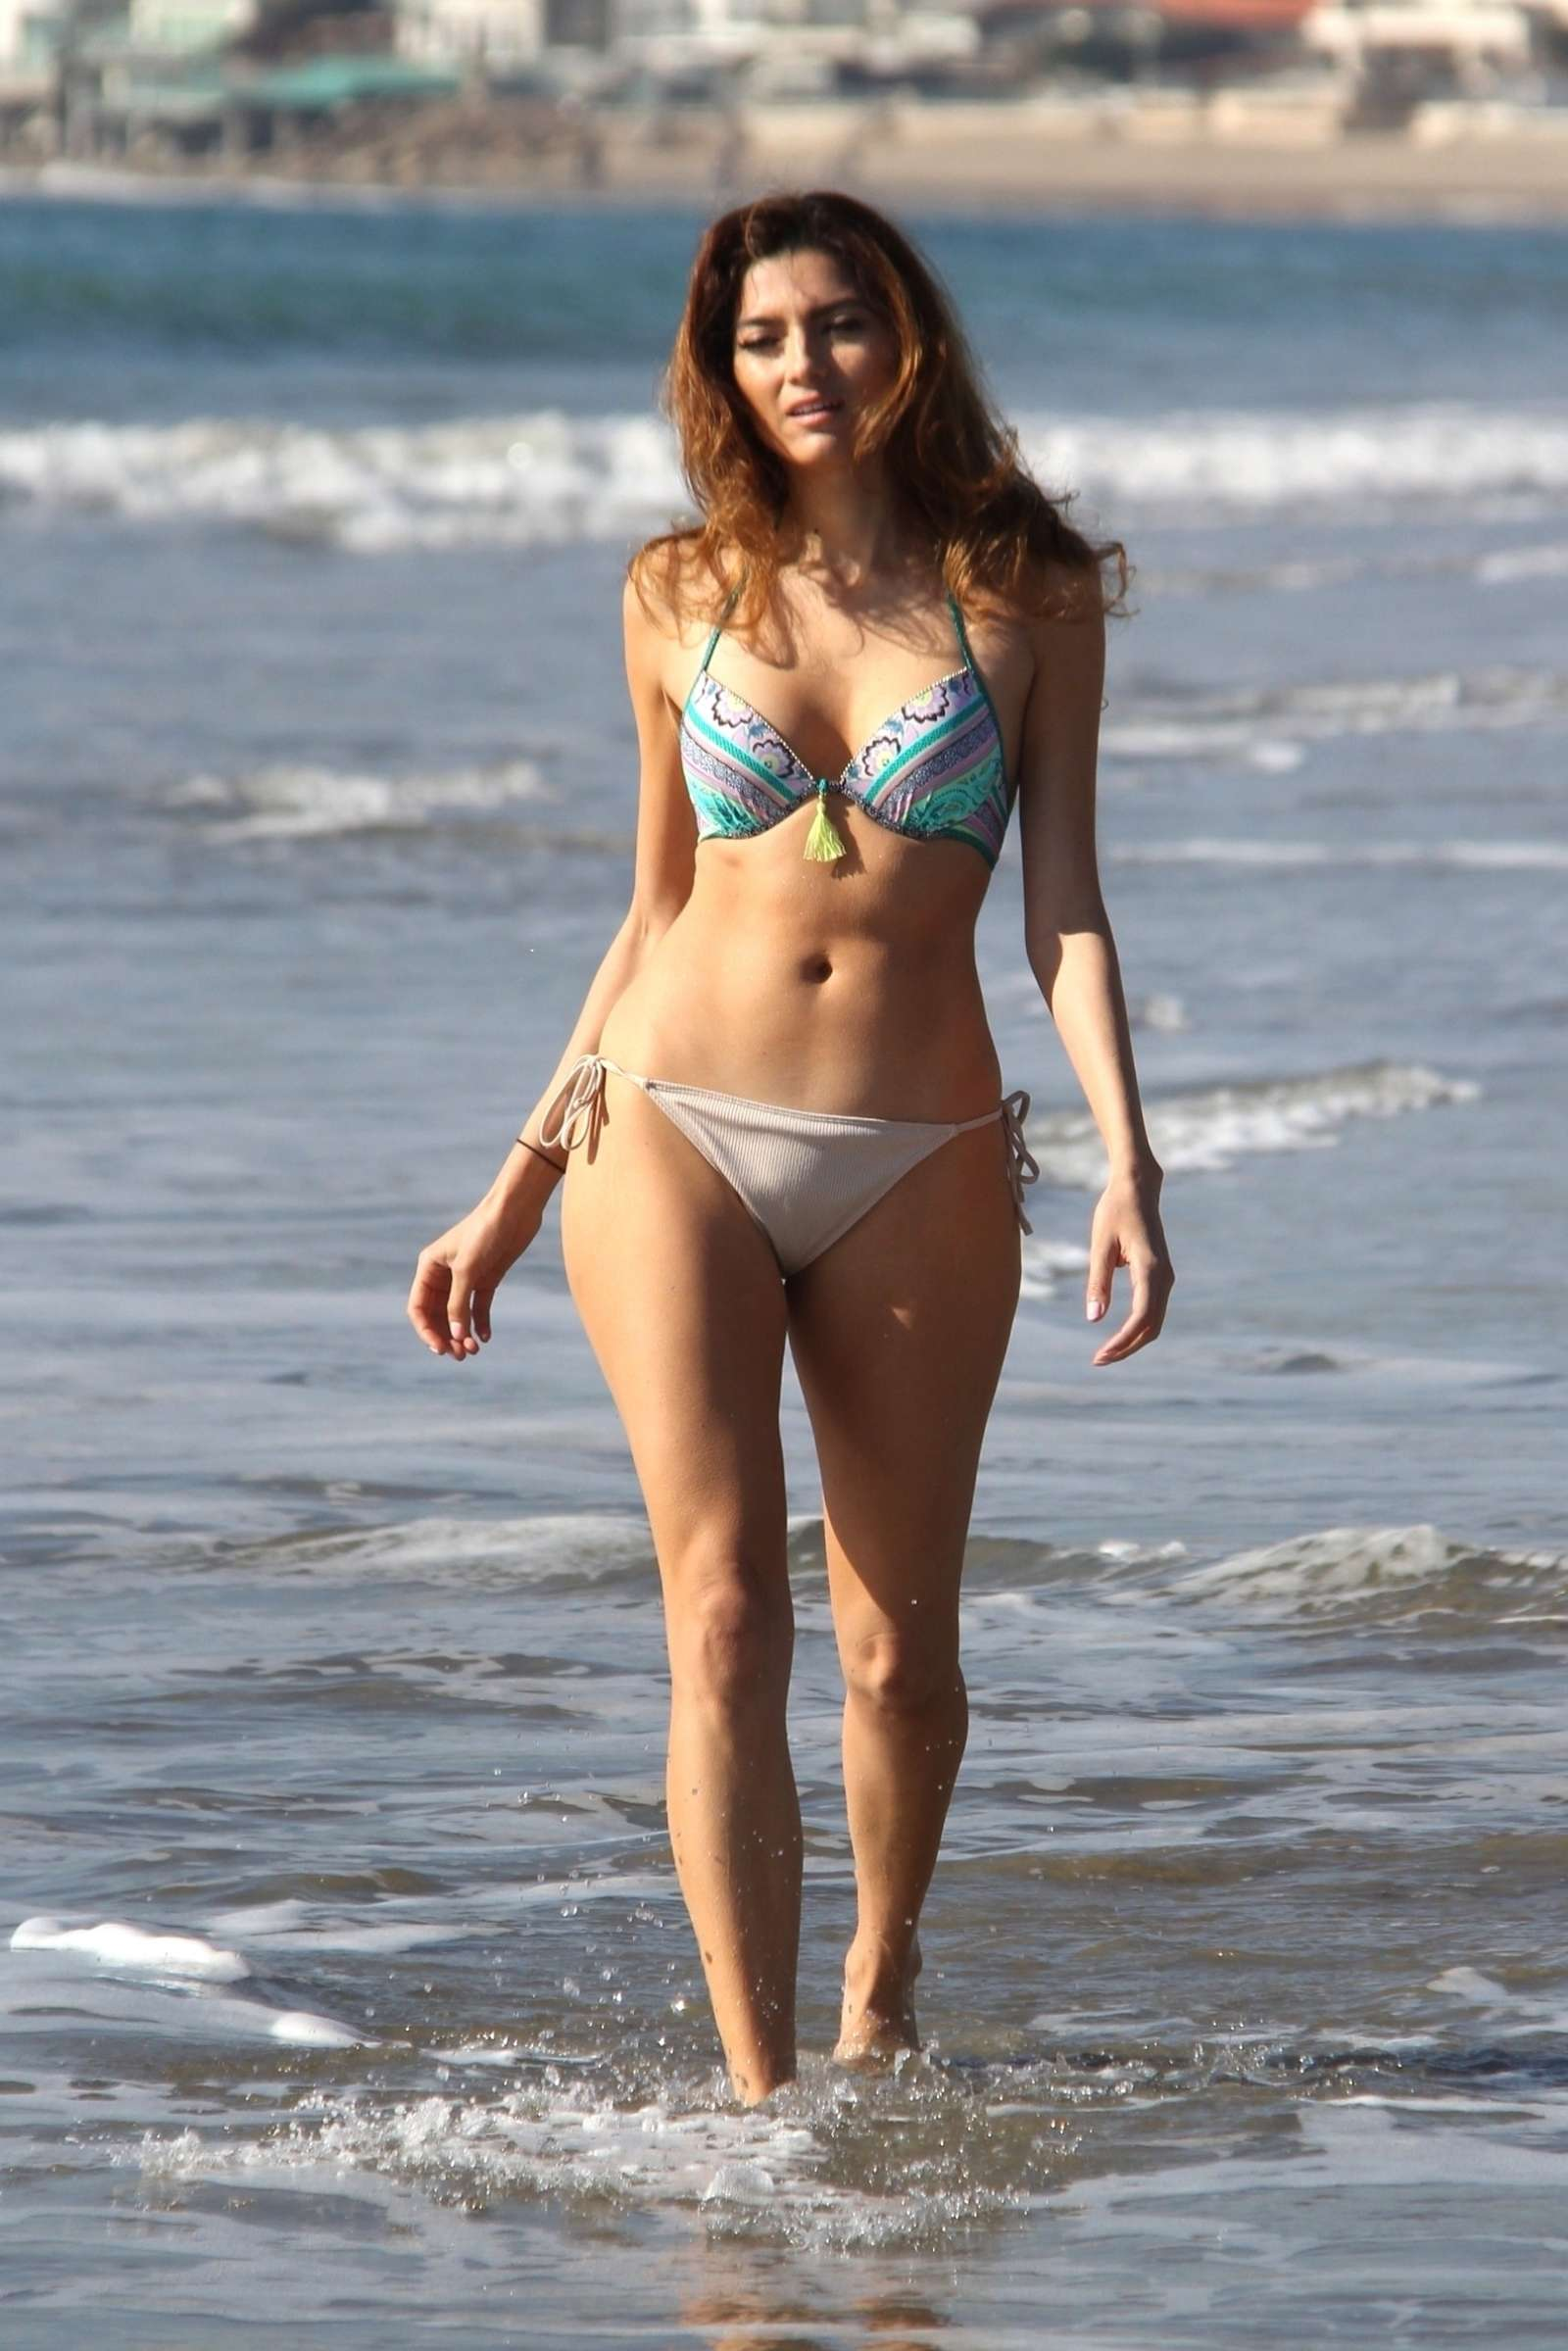 Bikini Denise Capezza naked (26 photo), Sexy, Bikini, Instagram, in bikini 2018